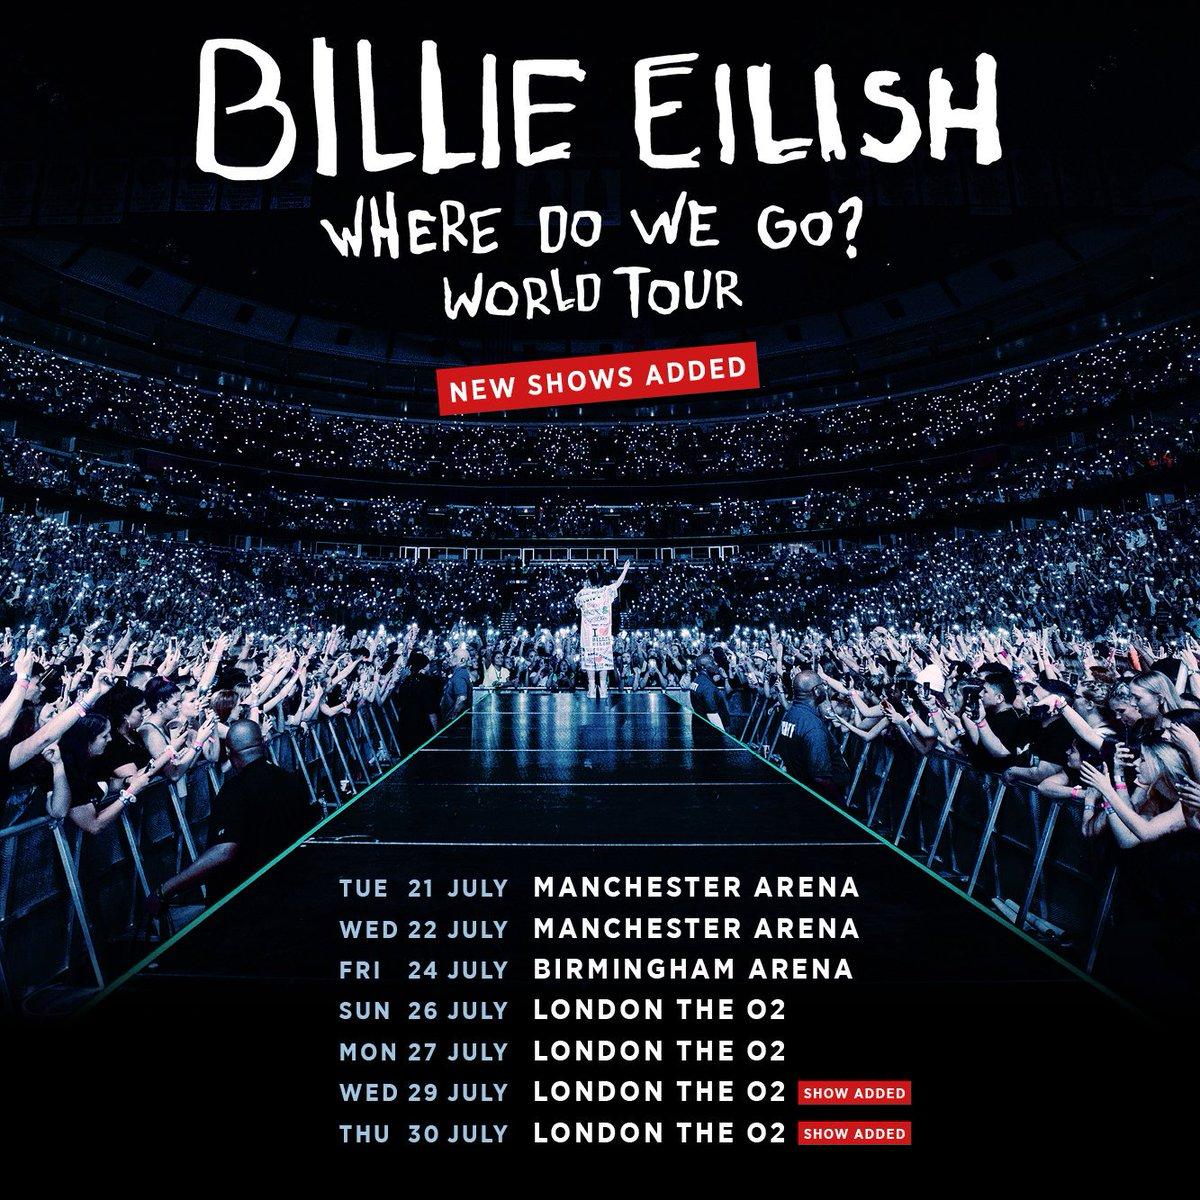 #BillieEilish Where Do We Go UK Tour, 21-30 July 2020  Tix {https://fave.co/2mwmM81}  #affiliate #BritAwards2020 #BRITs #ticketmaster #BRITsAT40 #birmingham #london #billieeilishtickets #Londonislovinit #notimetodie #jamesbond #Brits2020 #Londonislovinit